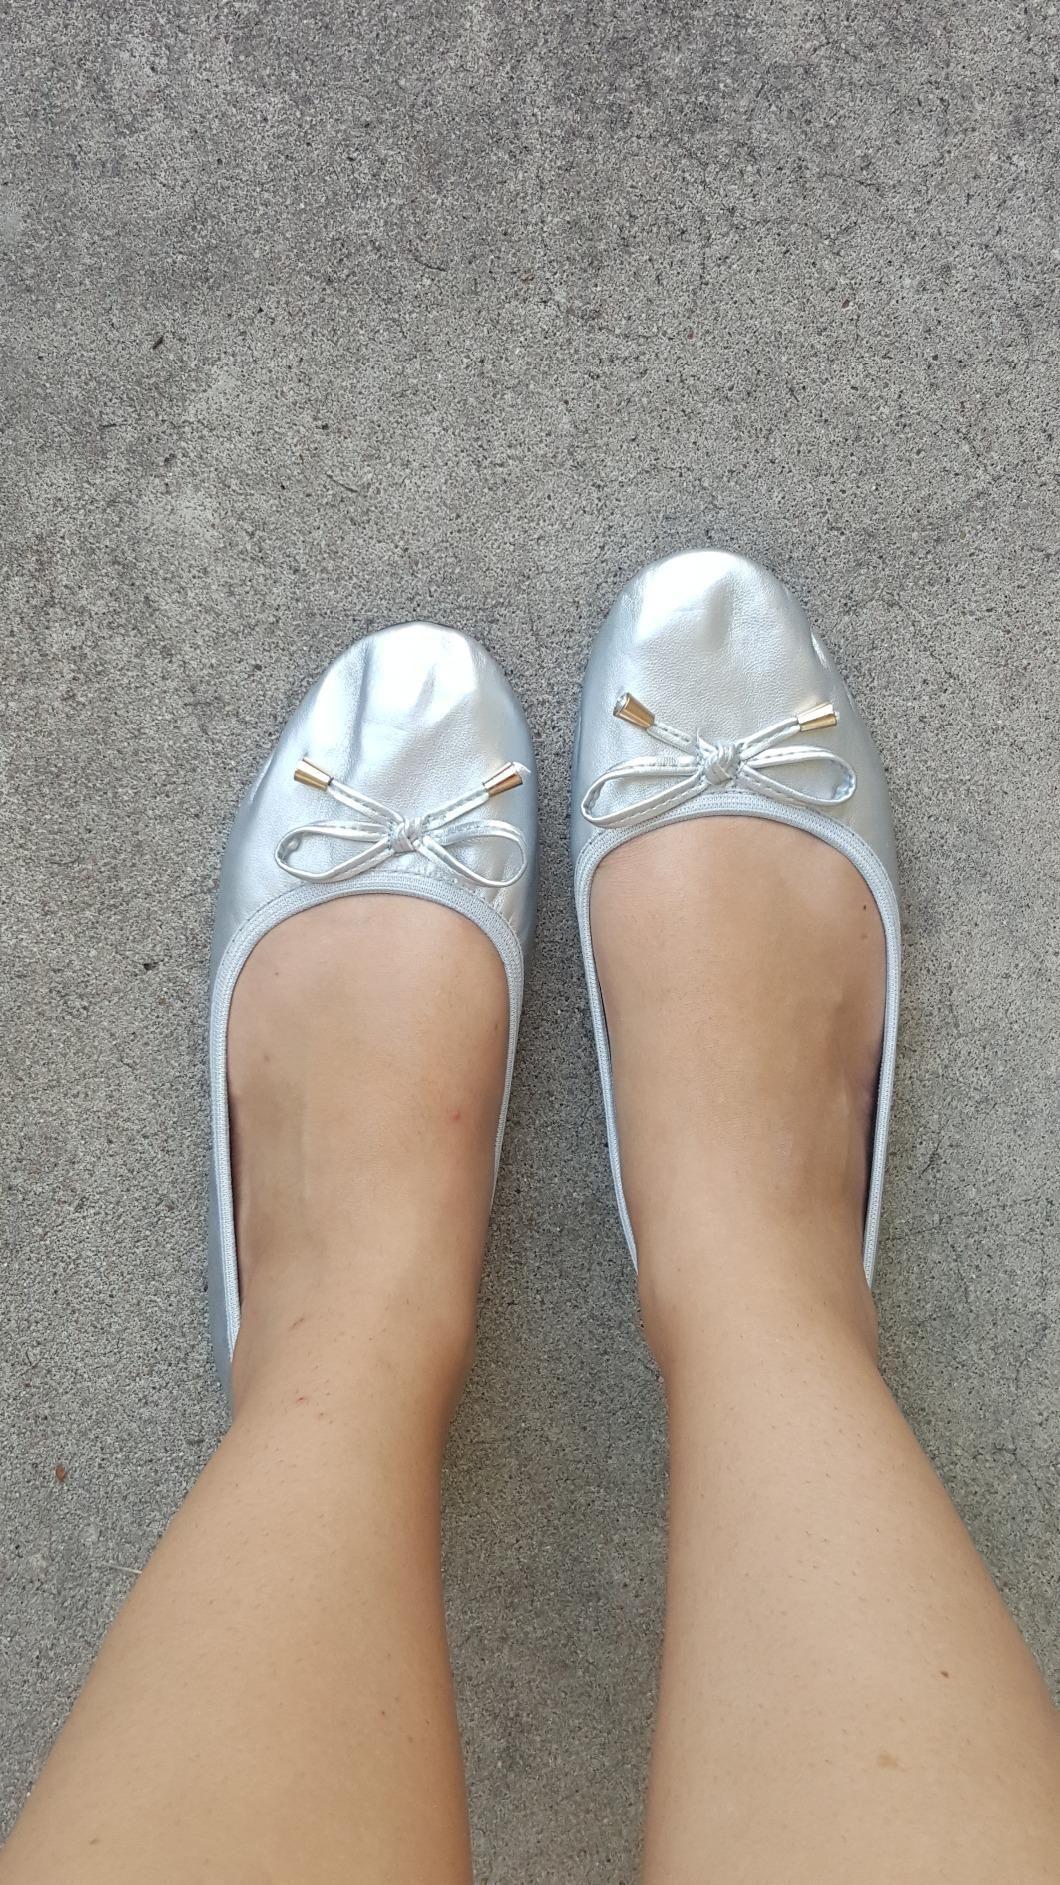 84fb7de2e Amazon.com: Customer reviews: Shoes 18 Women's Foldable Portable Travel  Ballet Flat Shoes w/Matching Carrying Case